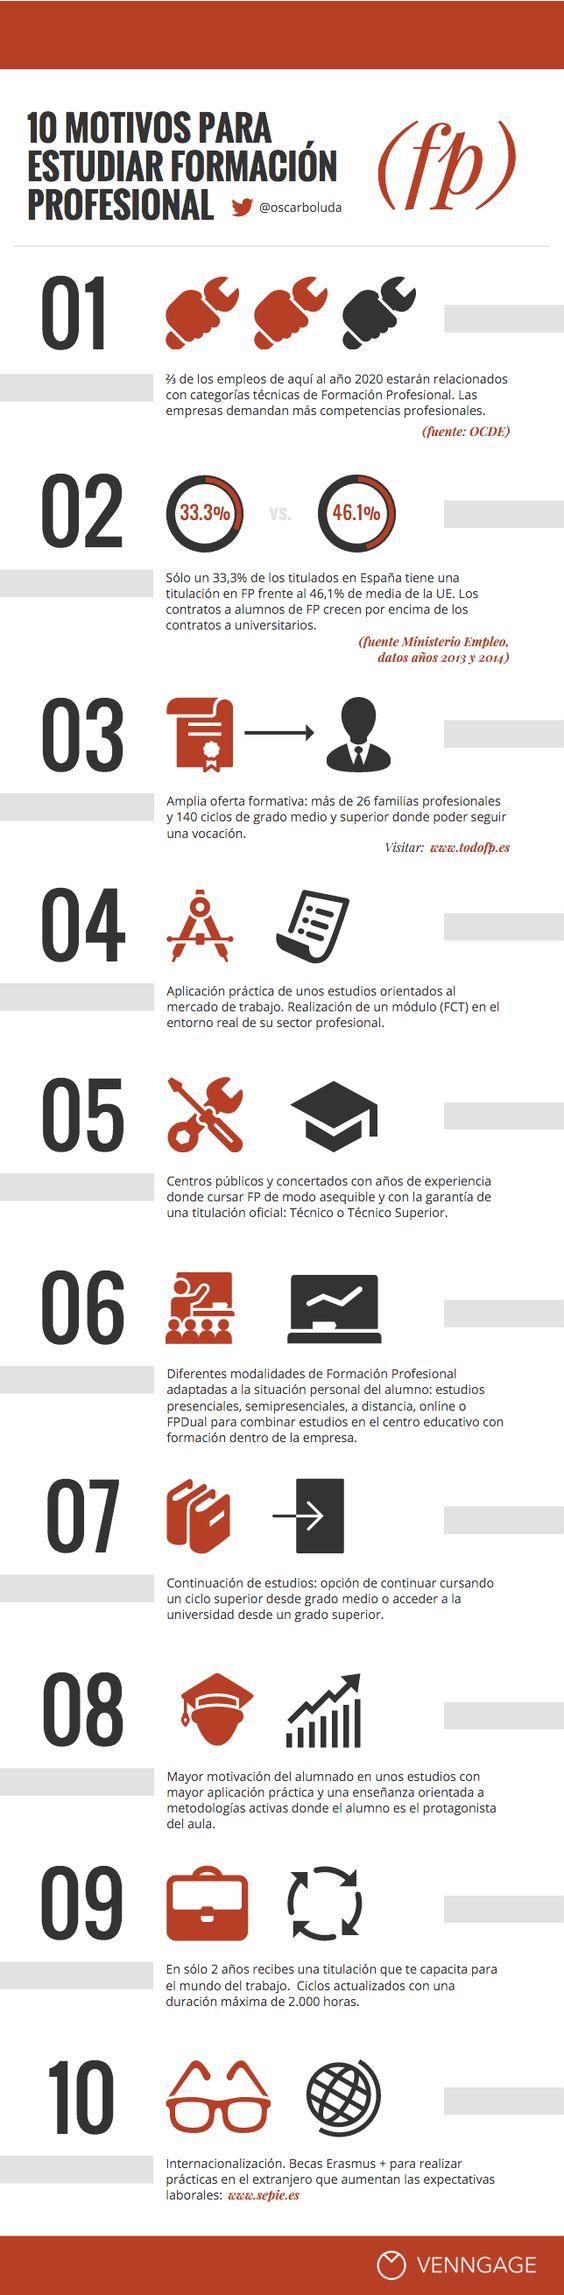 10-motivos-estudiar-formacion-profesional-infografia: